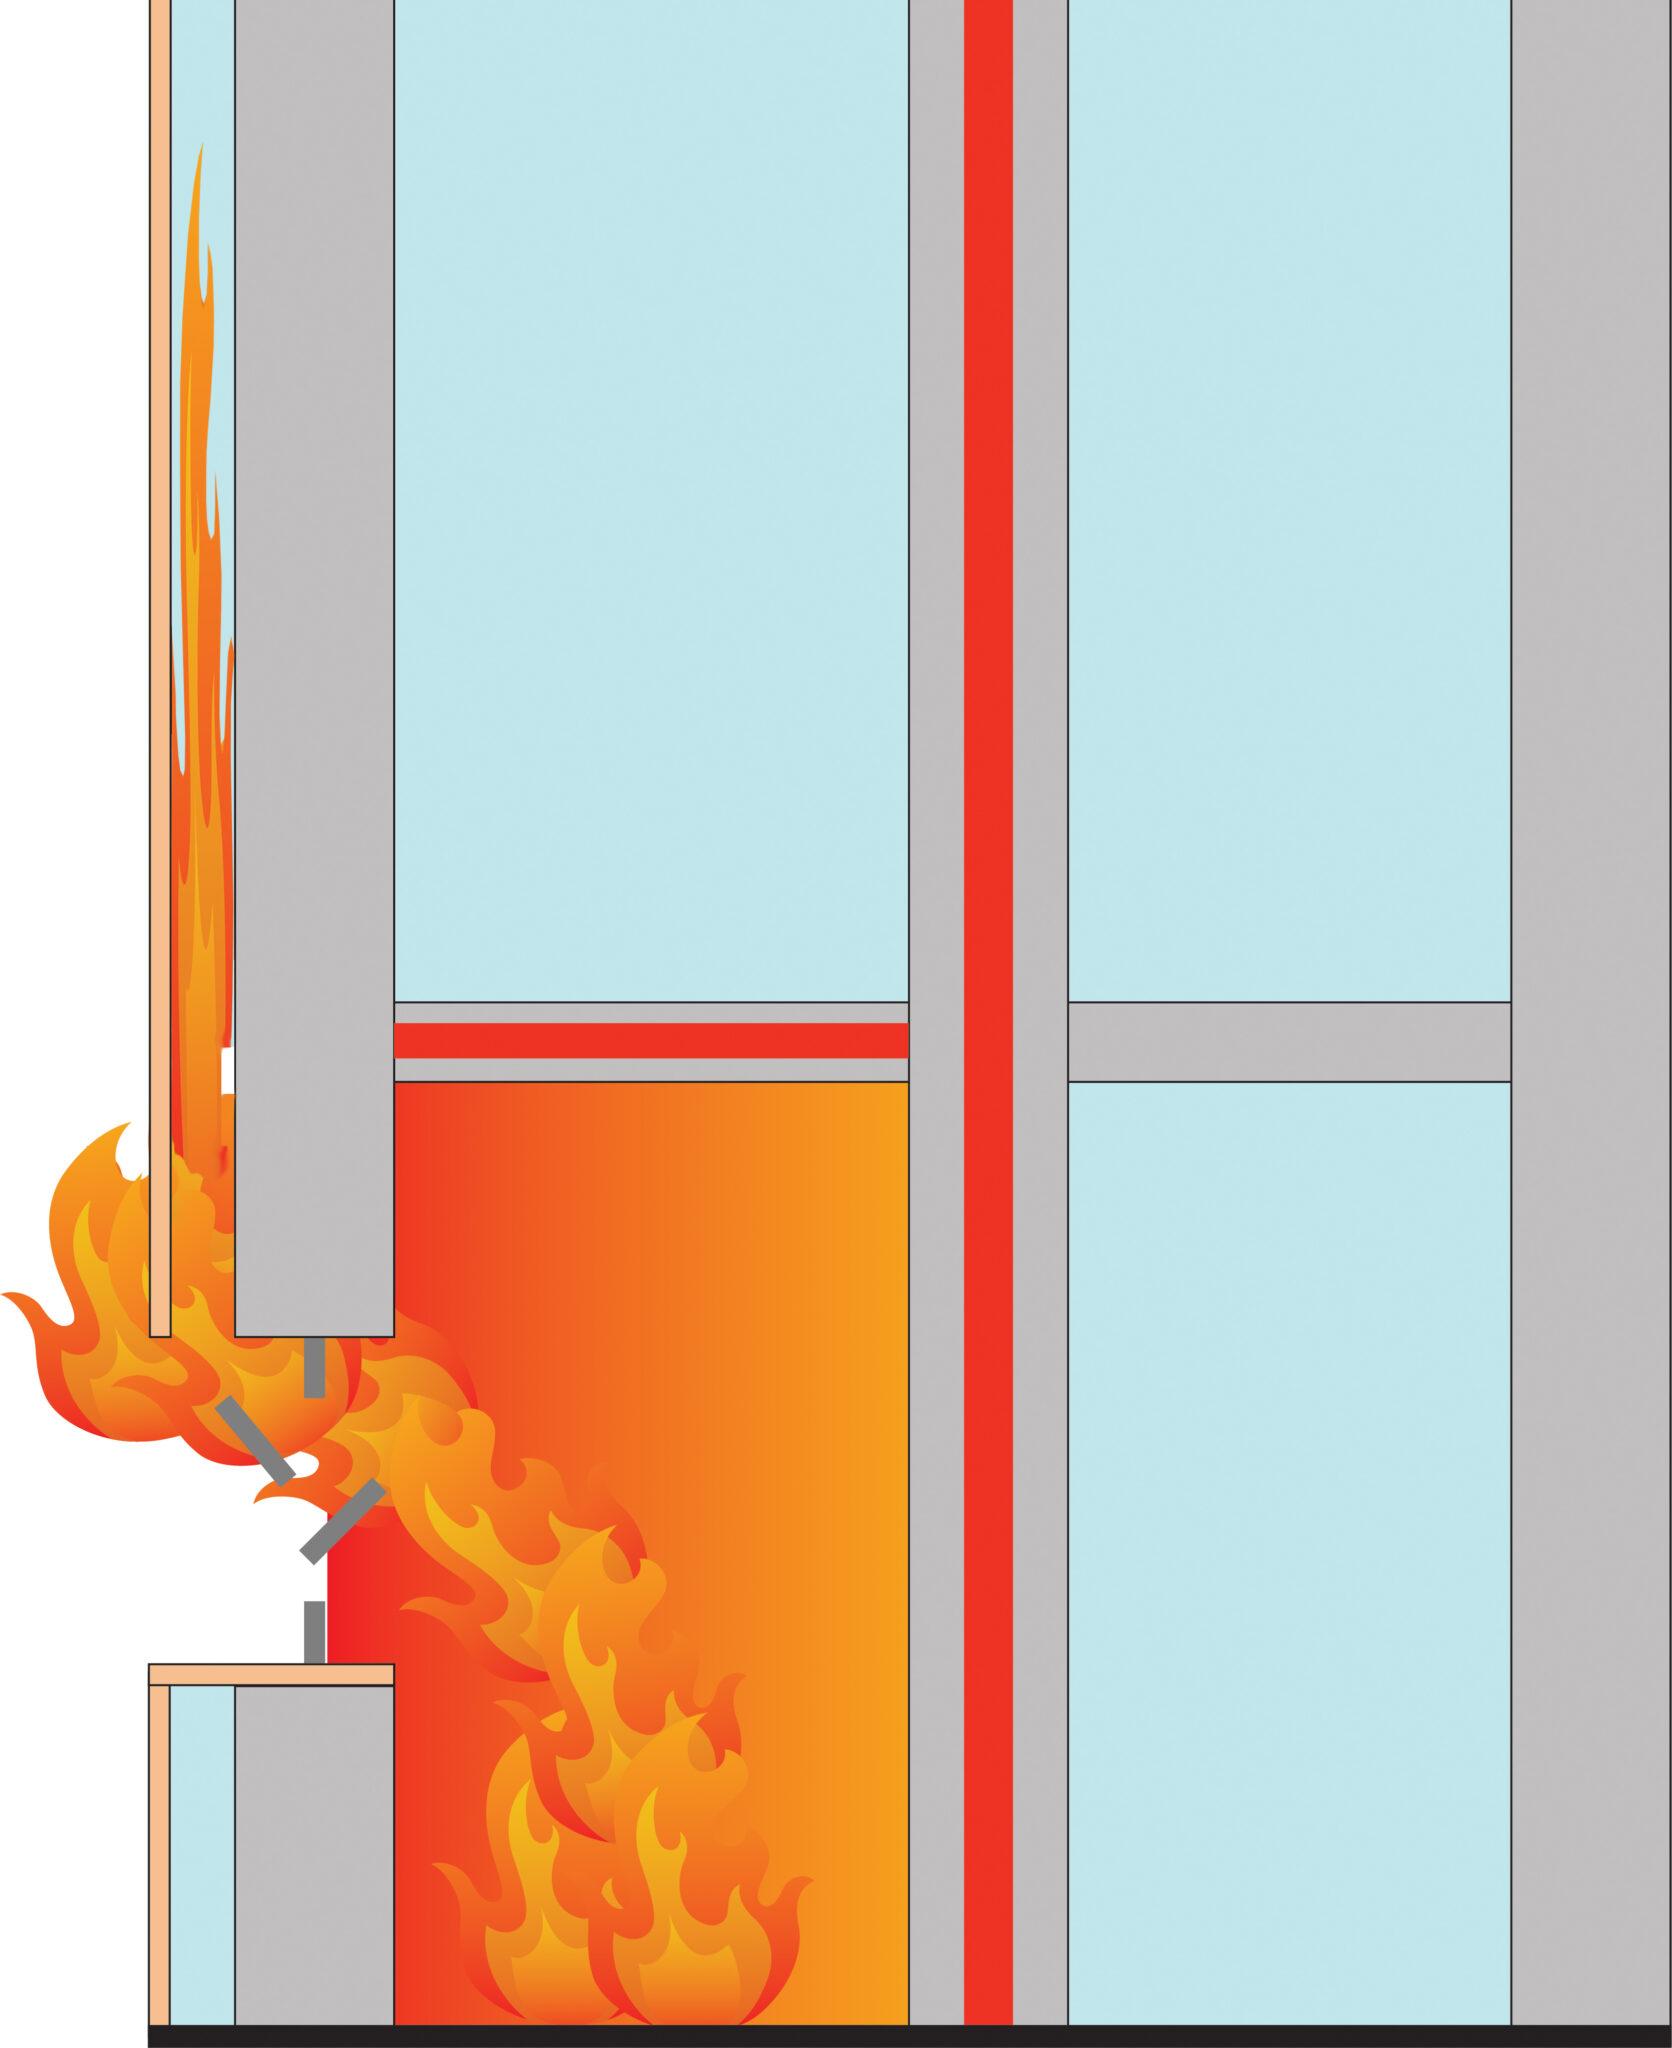 Oskyddad fasad